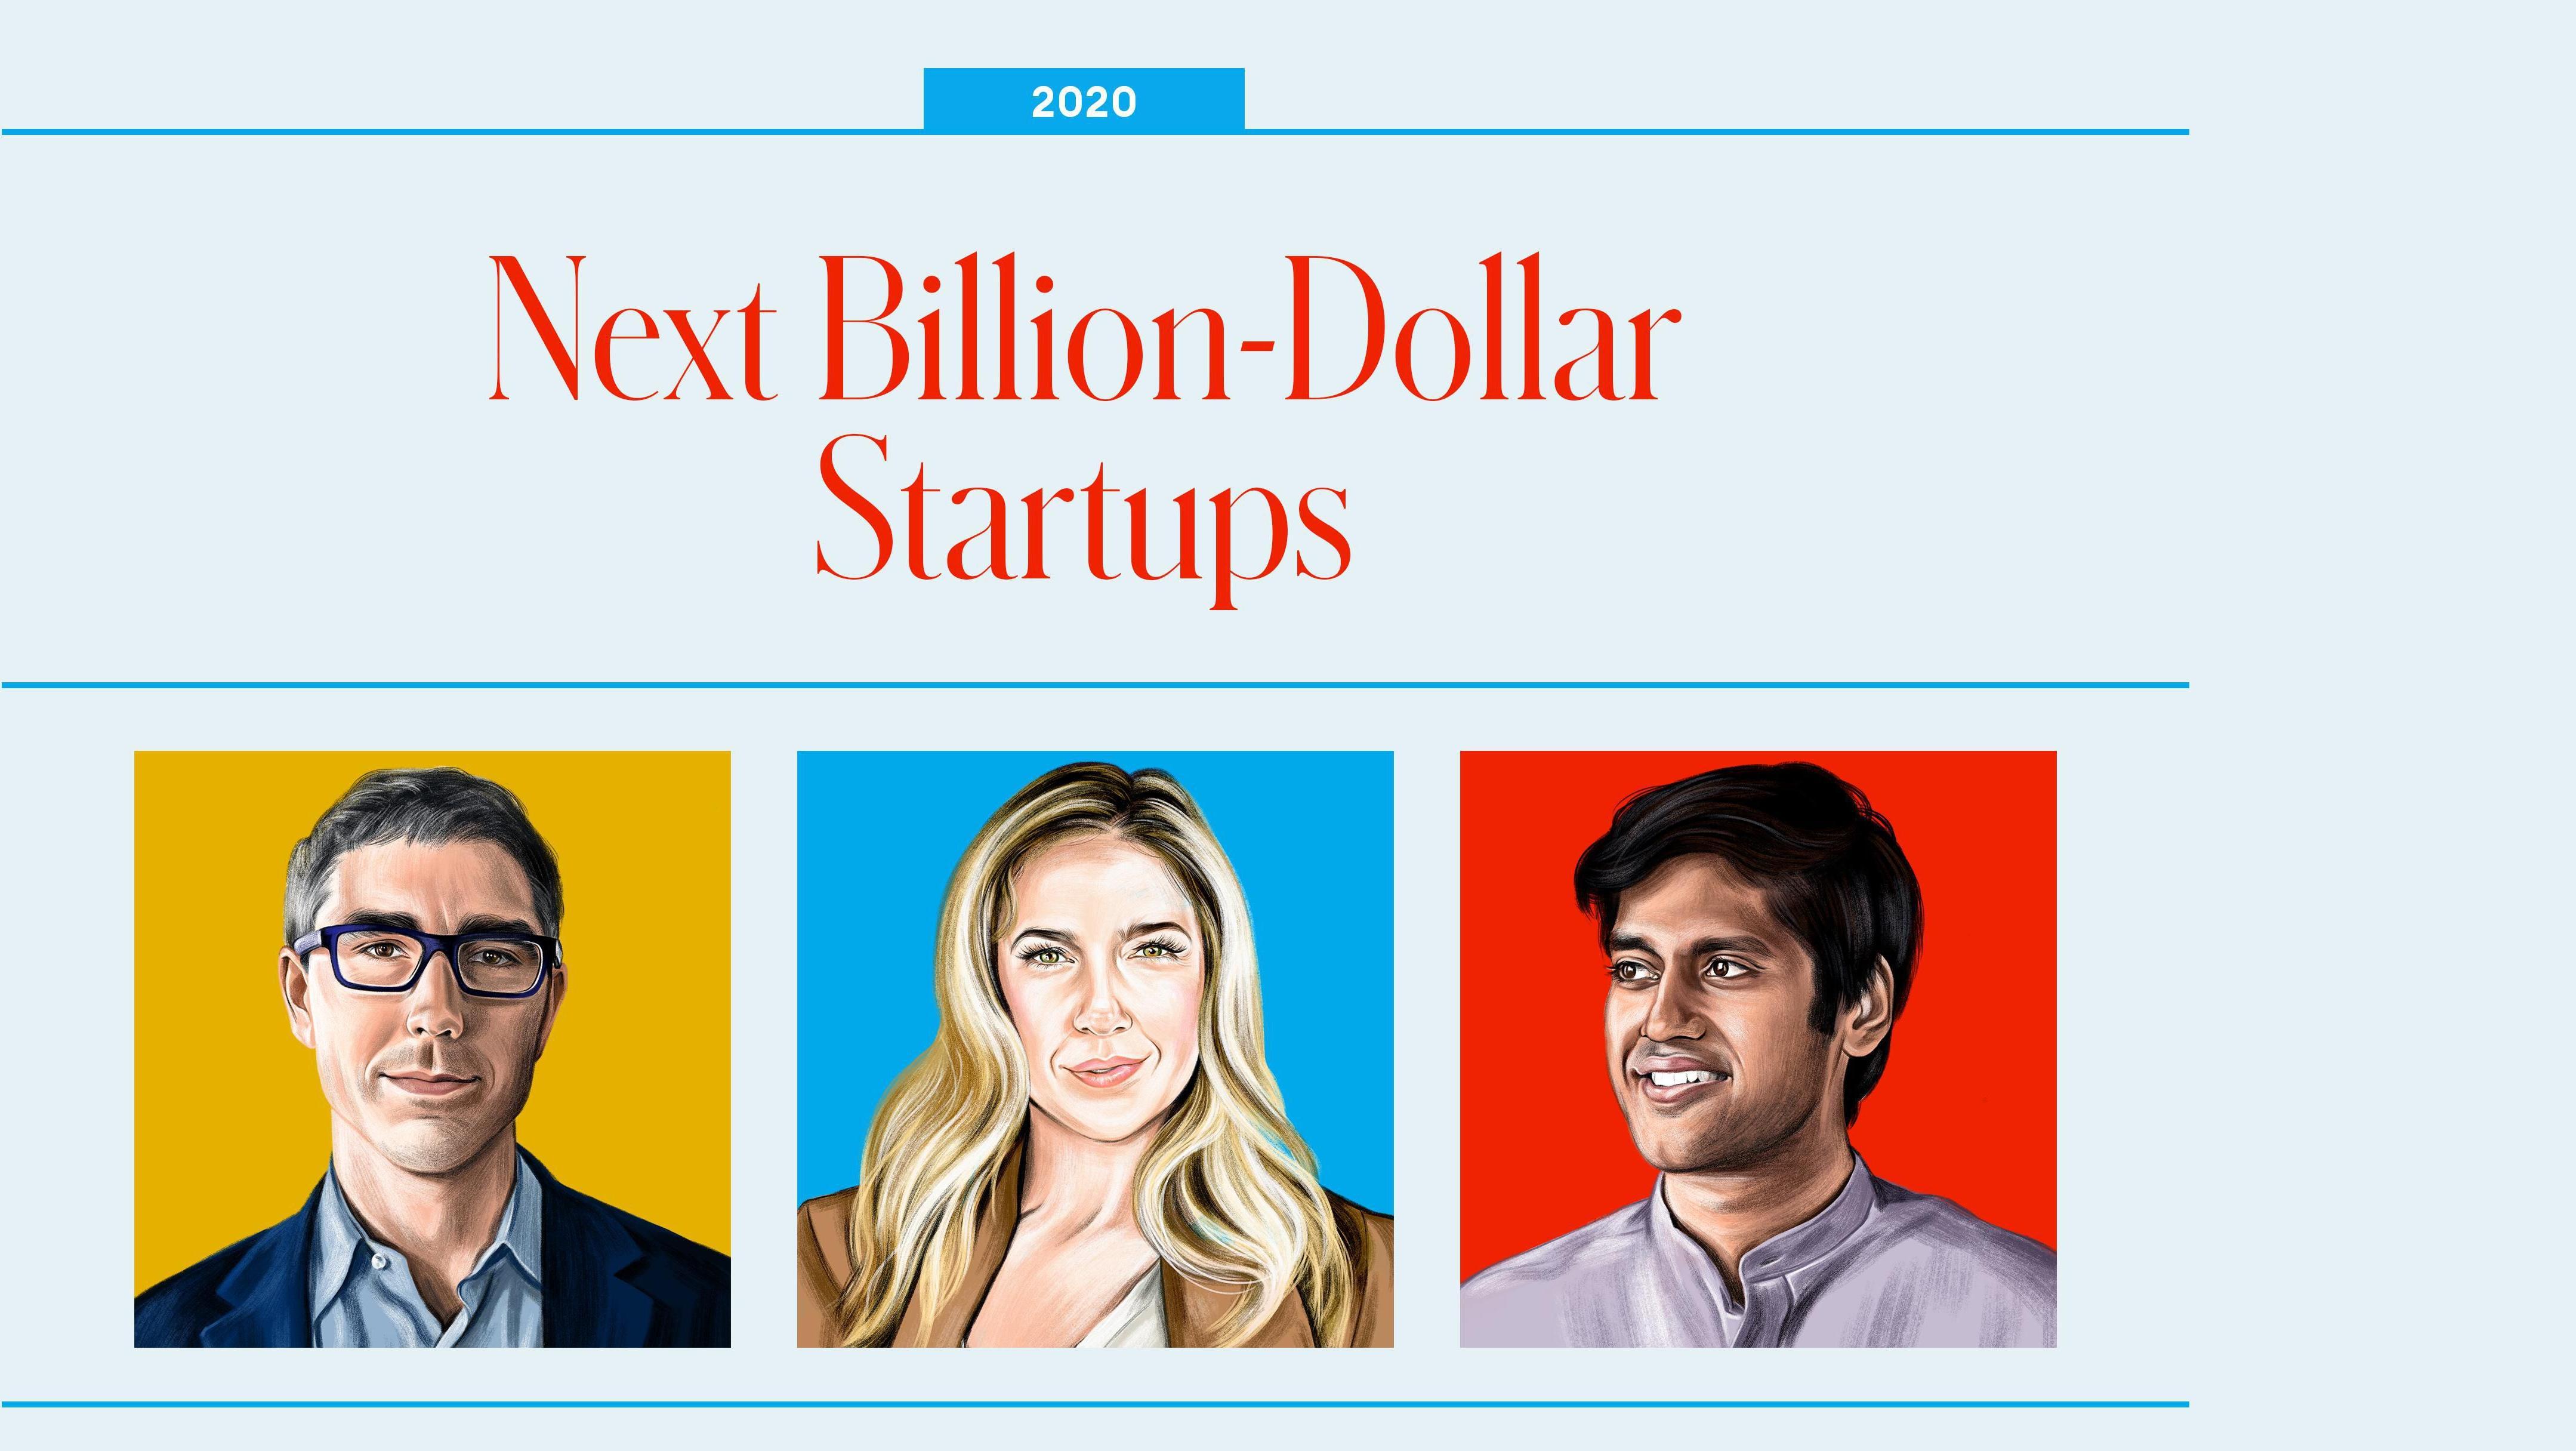 Forbes 2021 Next Billion-Dollar Startups List: Nominations Are Open